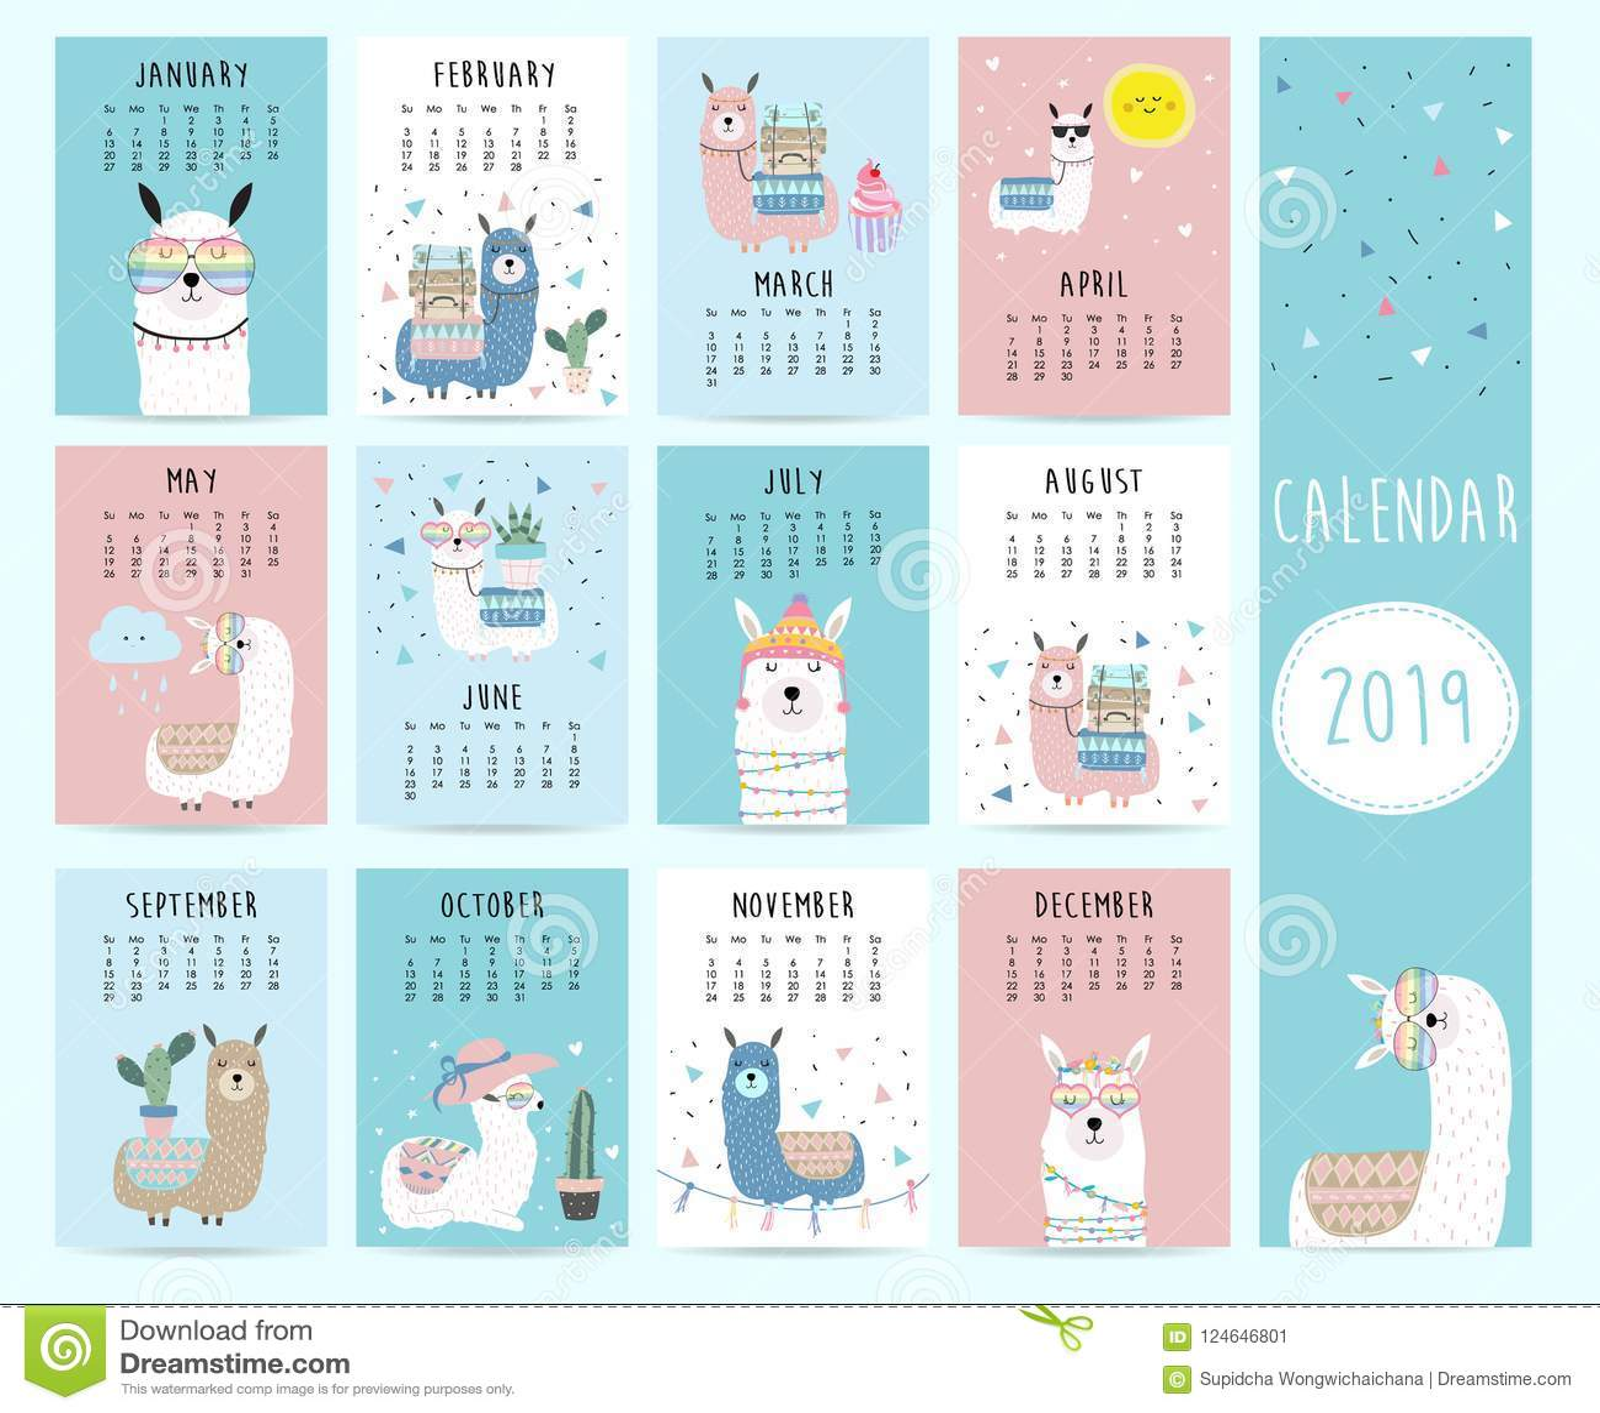 Cute Monthly Calendar 2019 With Llama Luggage Cactus Geometrical